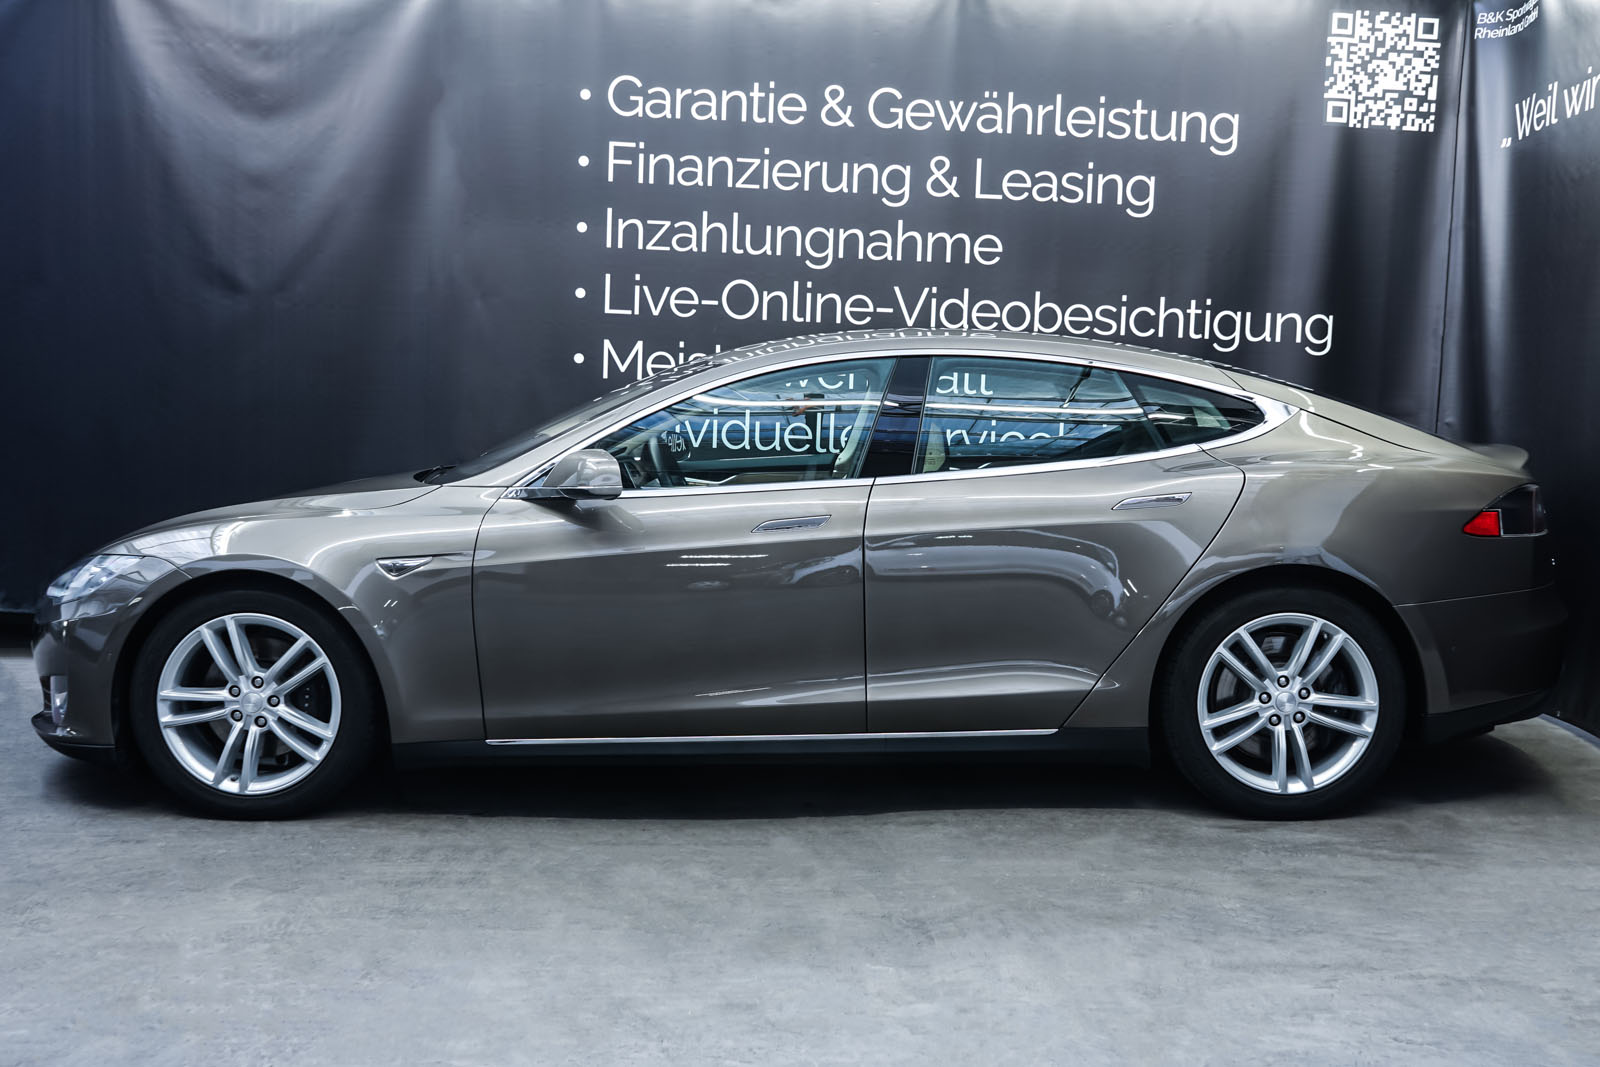 Tesla_ModelS85D_TitaniumMetallic_Beige_Tes-2897_5_w